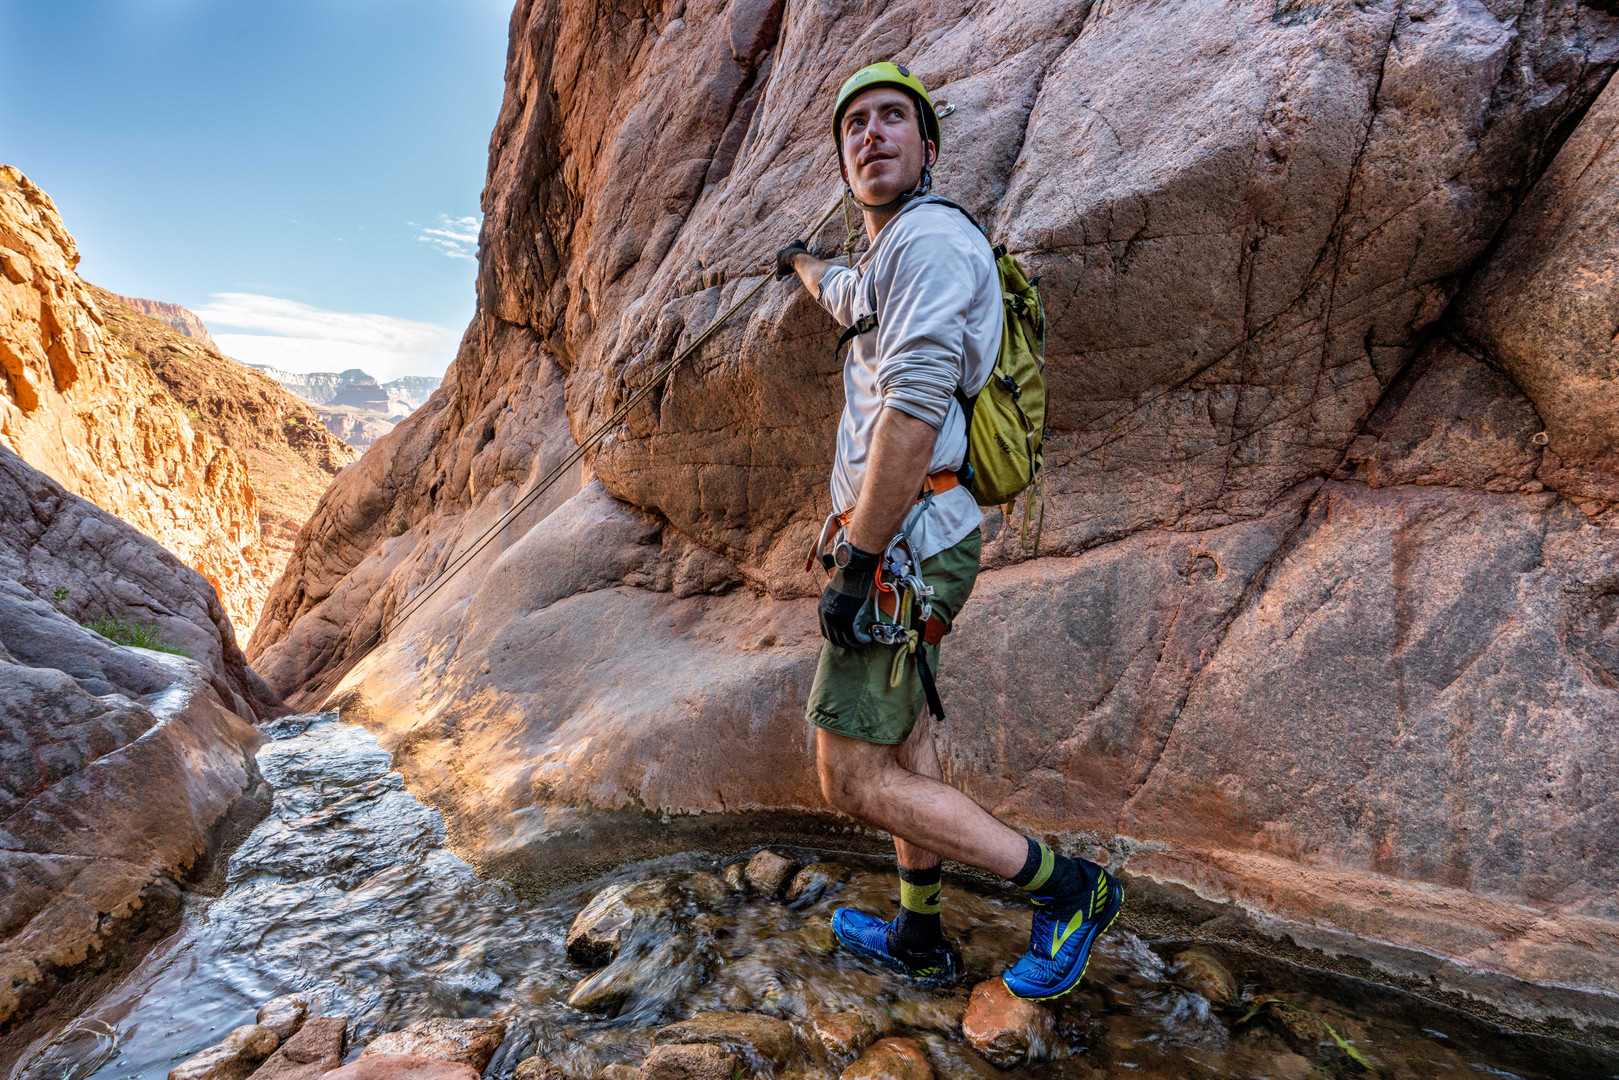 Canyoneering in Grand Canyon